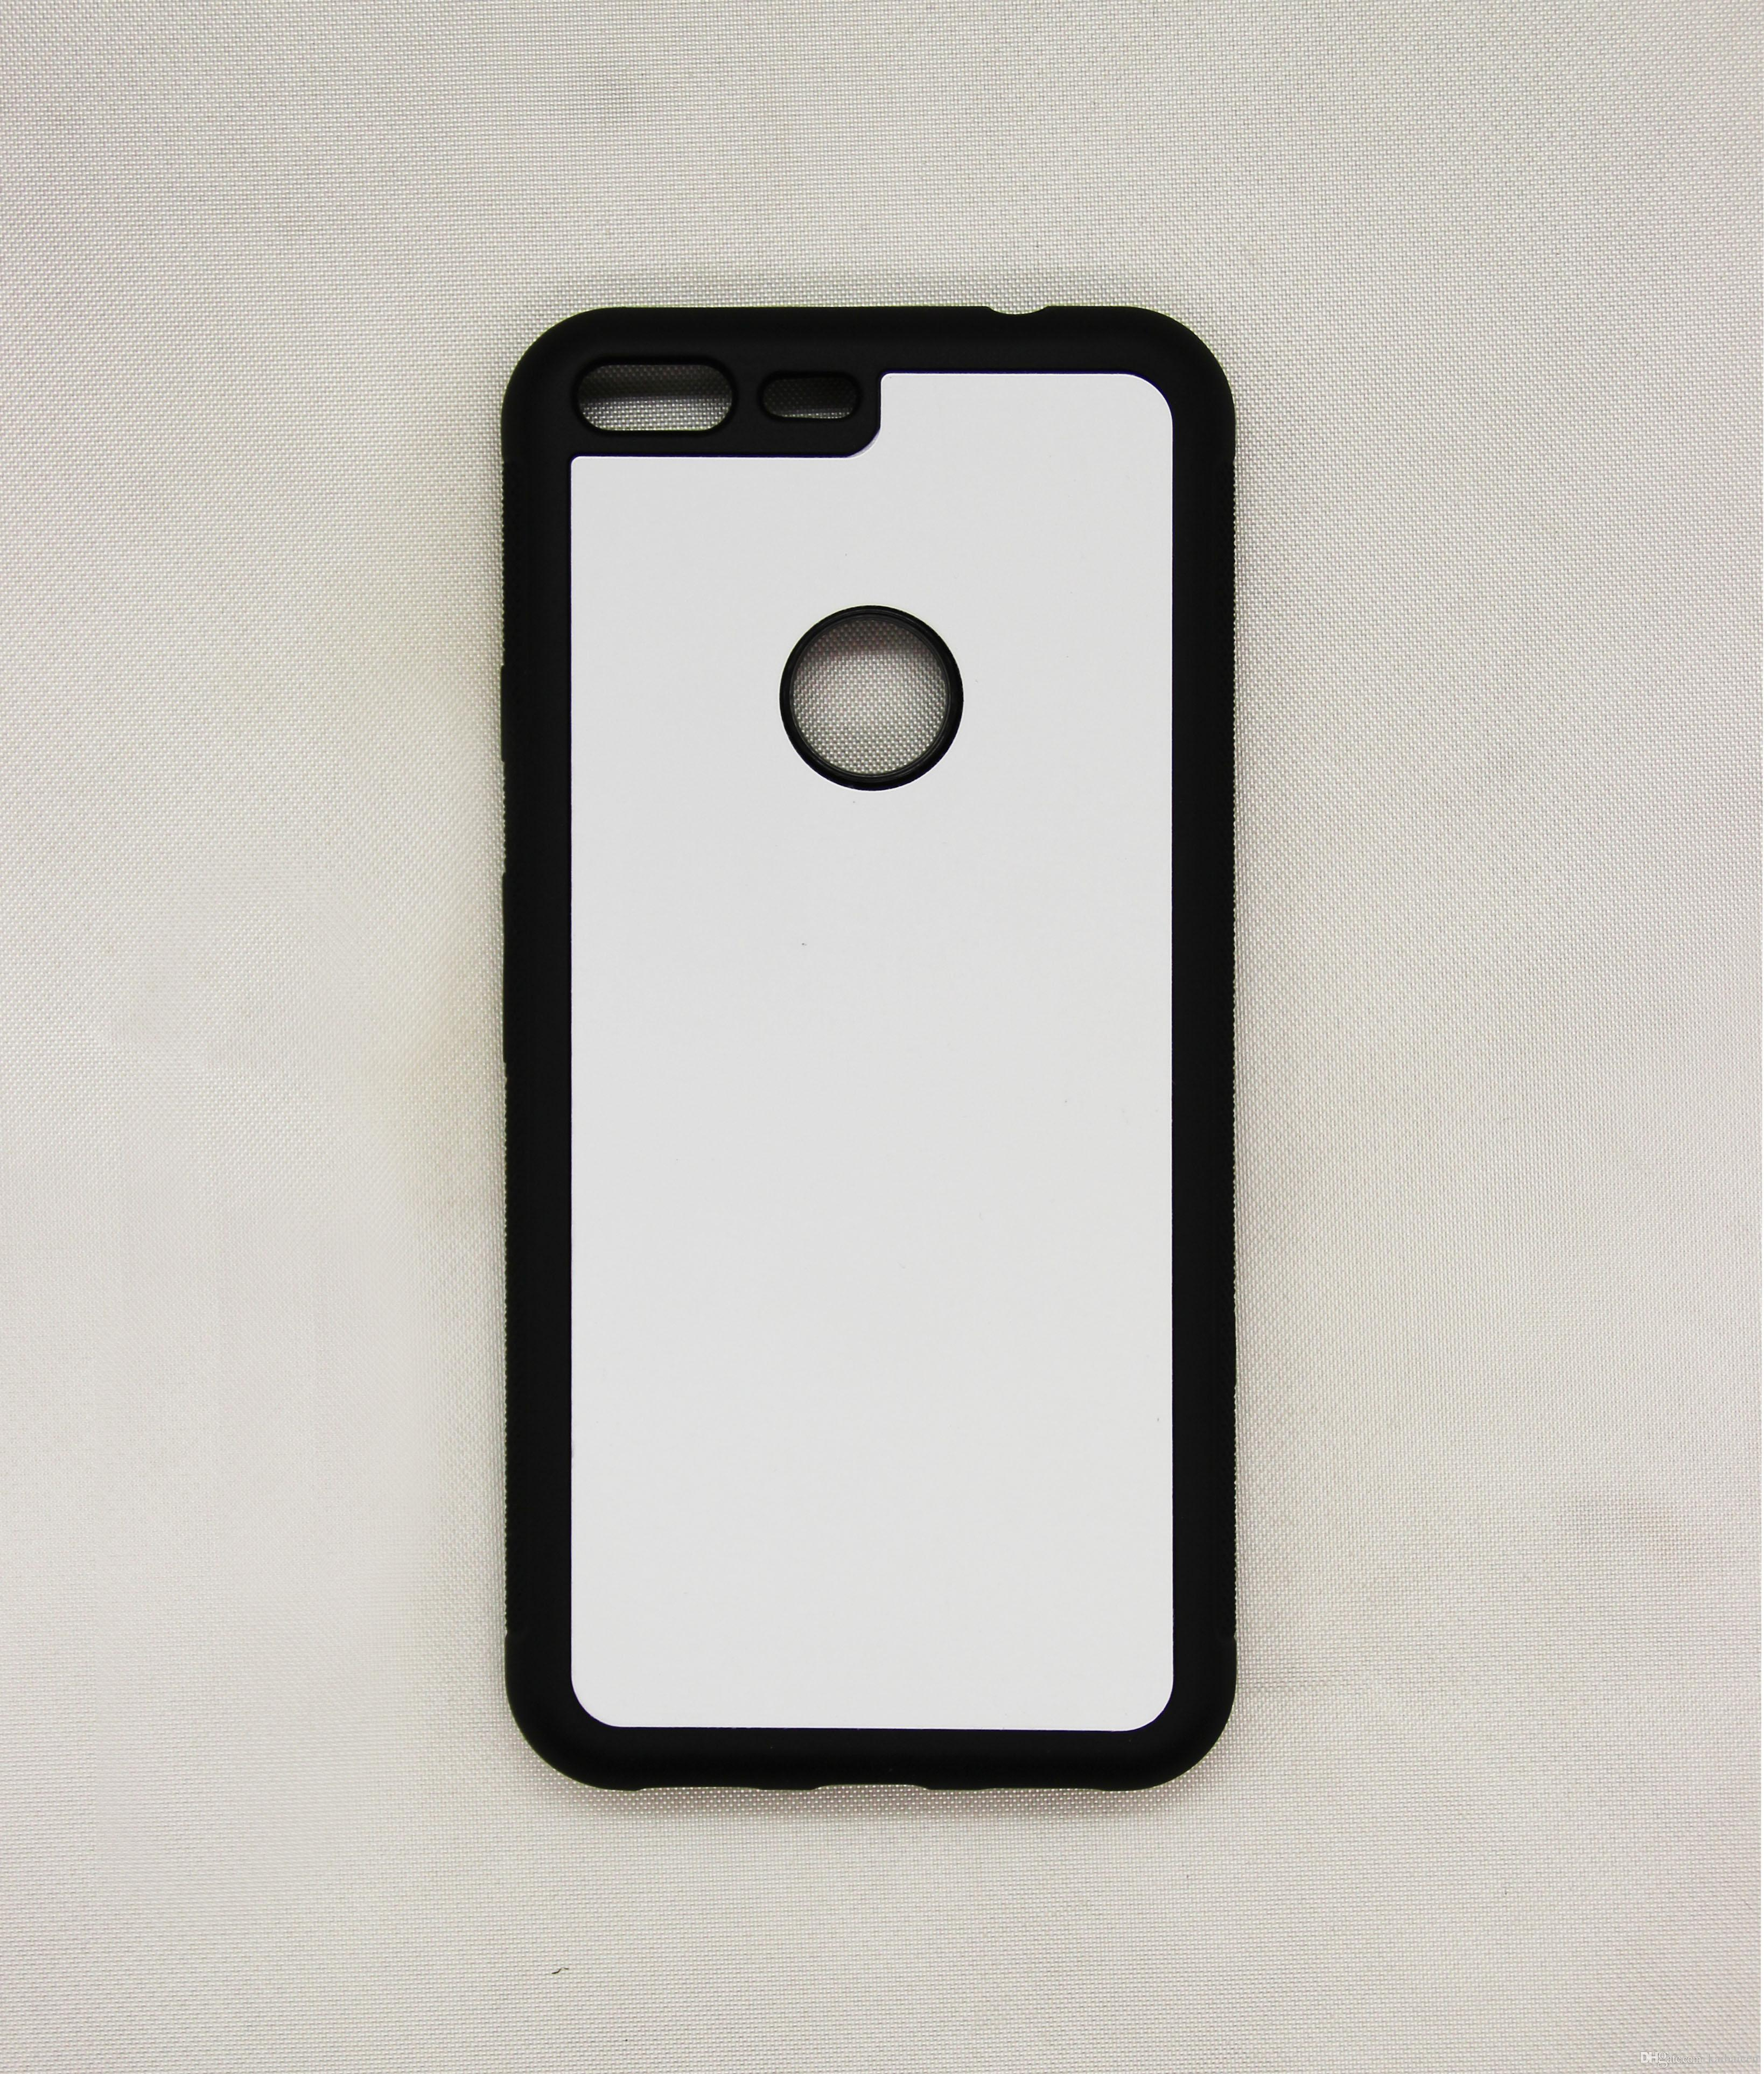 2D 승화 실리콘 케이스 HTC Goolge 픽셀 / 픽셀 XL / 10 EVO / 볼트 / M8 / M9 TPU + PC 고무 부드러운 빈 열전달 전화 커버